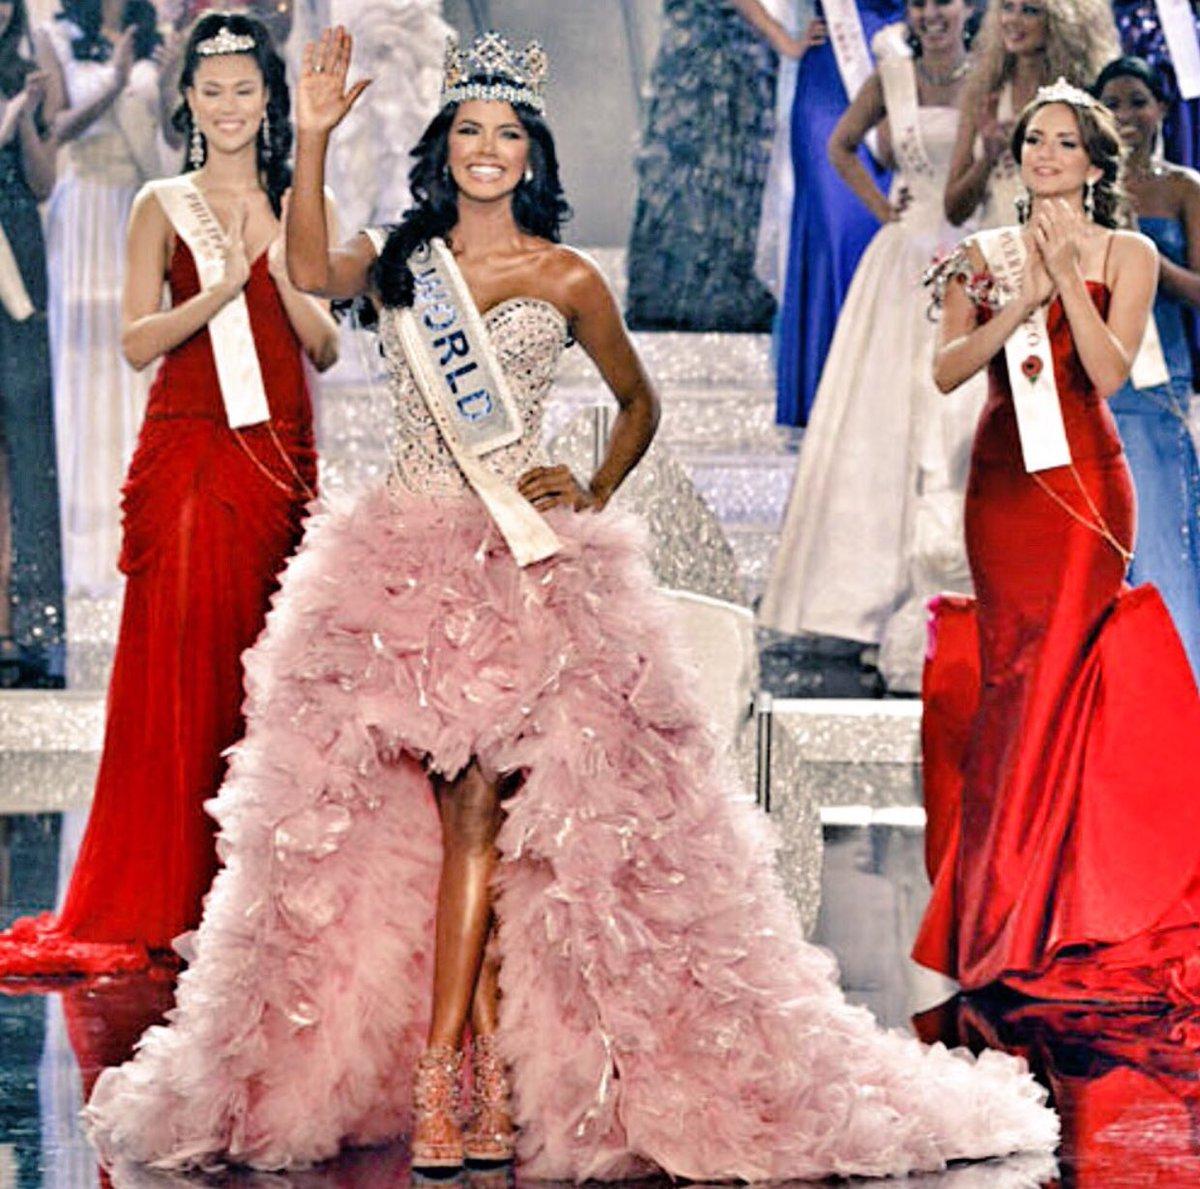 #TalDiaComoHoy hace seis años Ivian Sarcos ganó la 6ta corona de @MissWorldLtd para @missvzla #OrgulloMissVenezuela @2011MISSWORLD https://t.co/KQ7hacRPJR